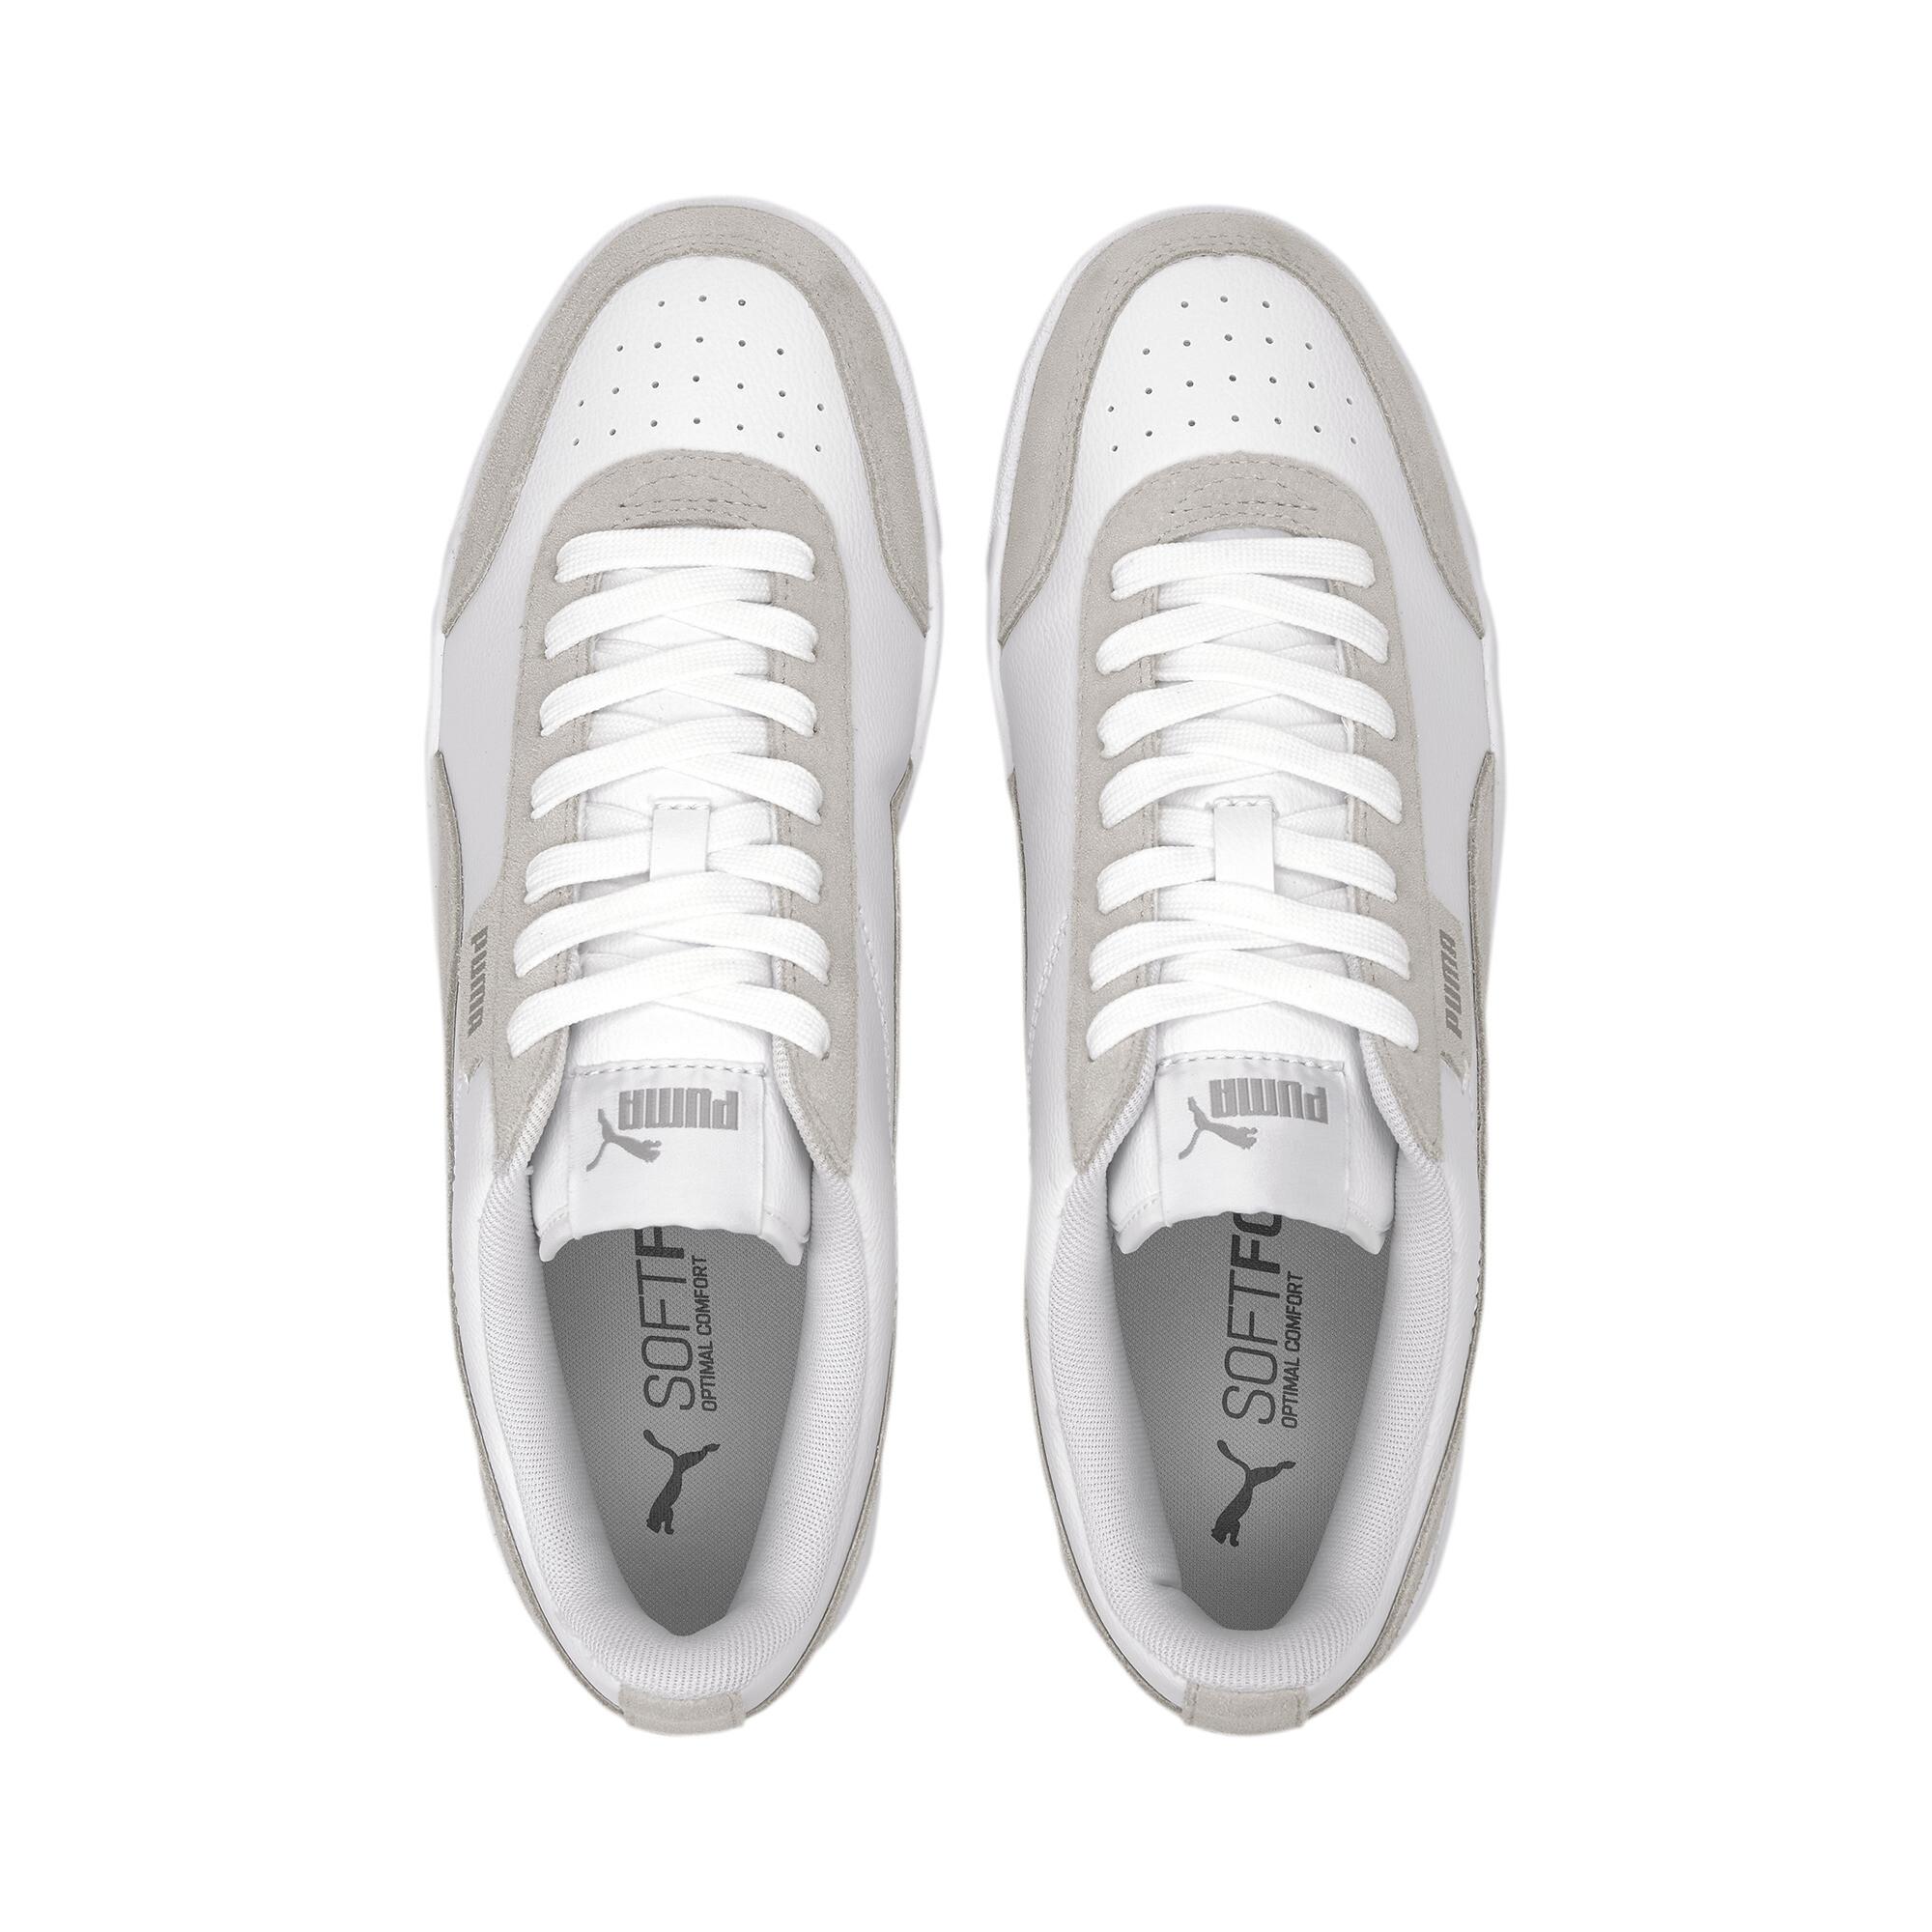 Indexbild 7 - PUMA Court Legend Lo Sneaker Unisex Schuhe Basics Neu